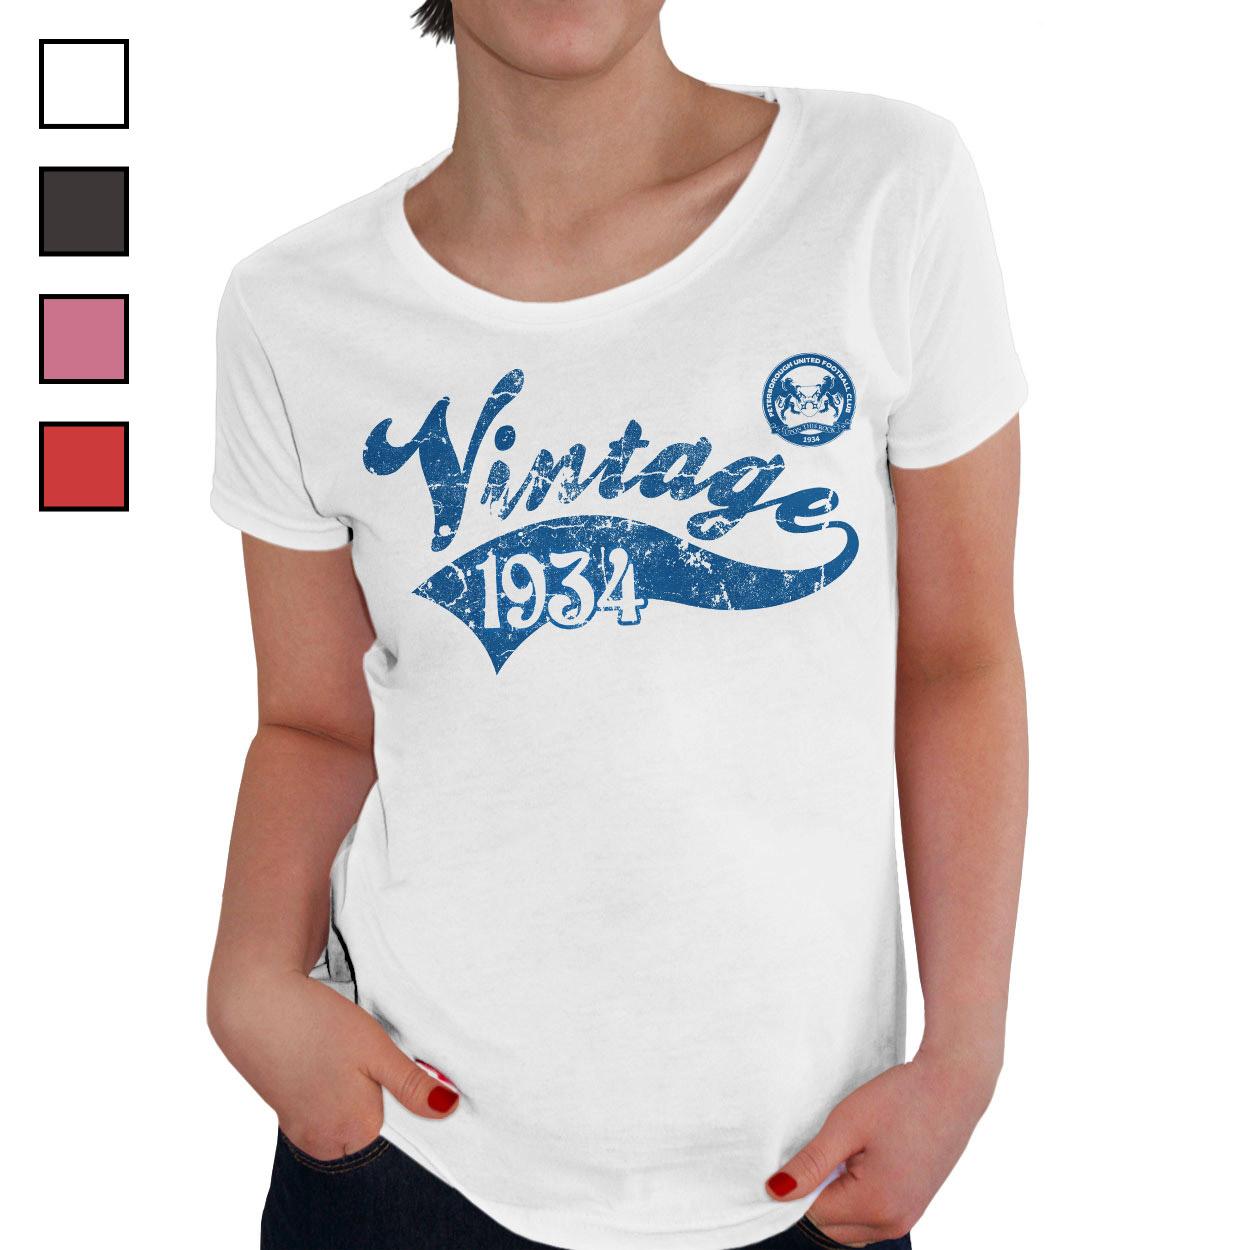 Peterborough United FC Ladies Vintage T-Shirt